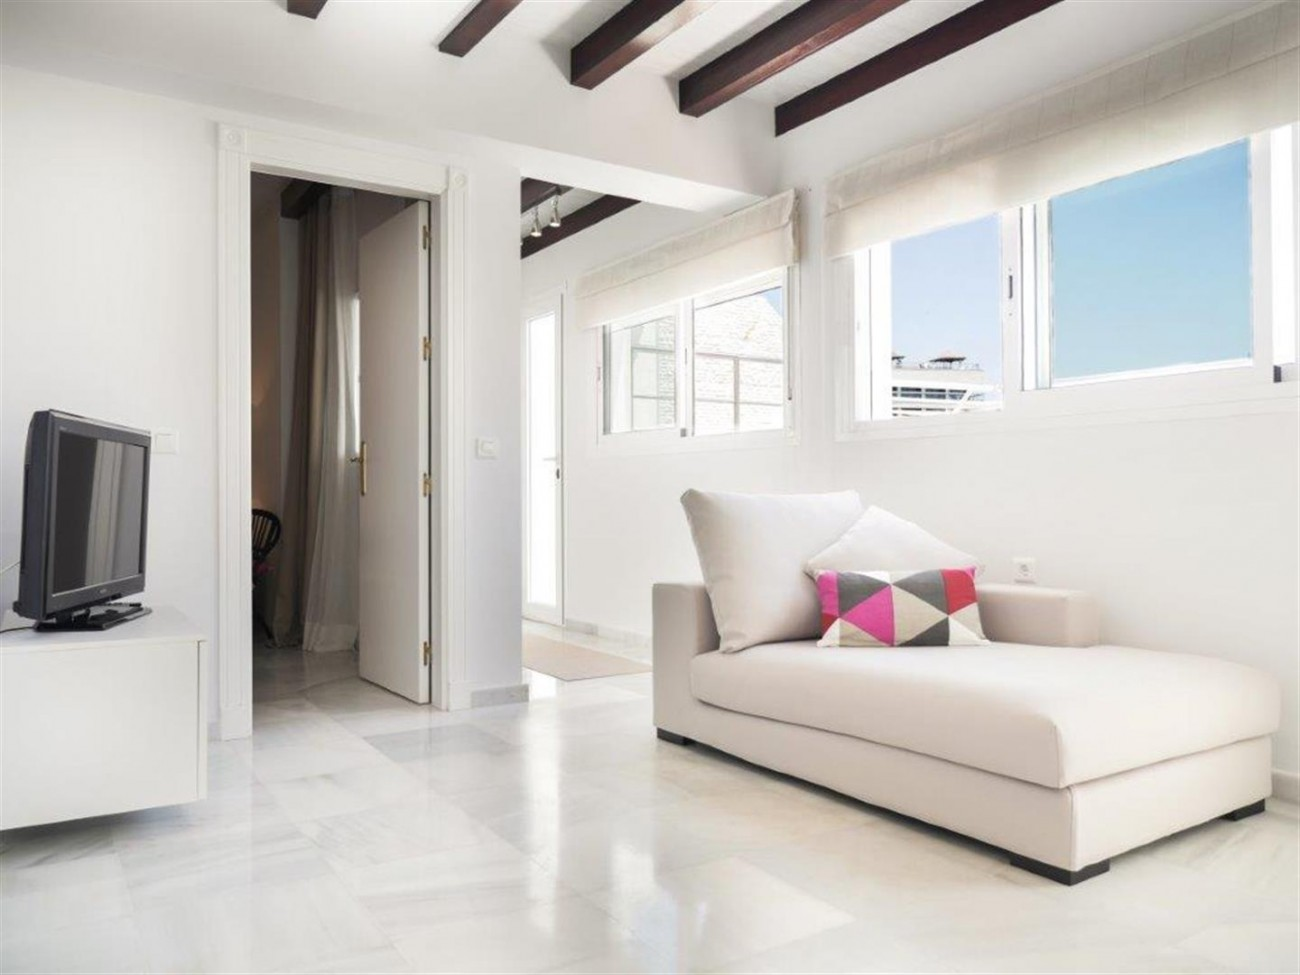 A5579 Frontline beach duplex penthouse Marbella 6 (Large)